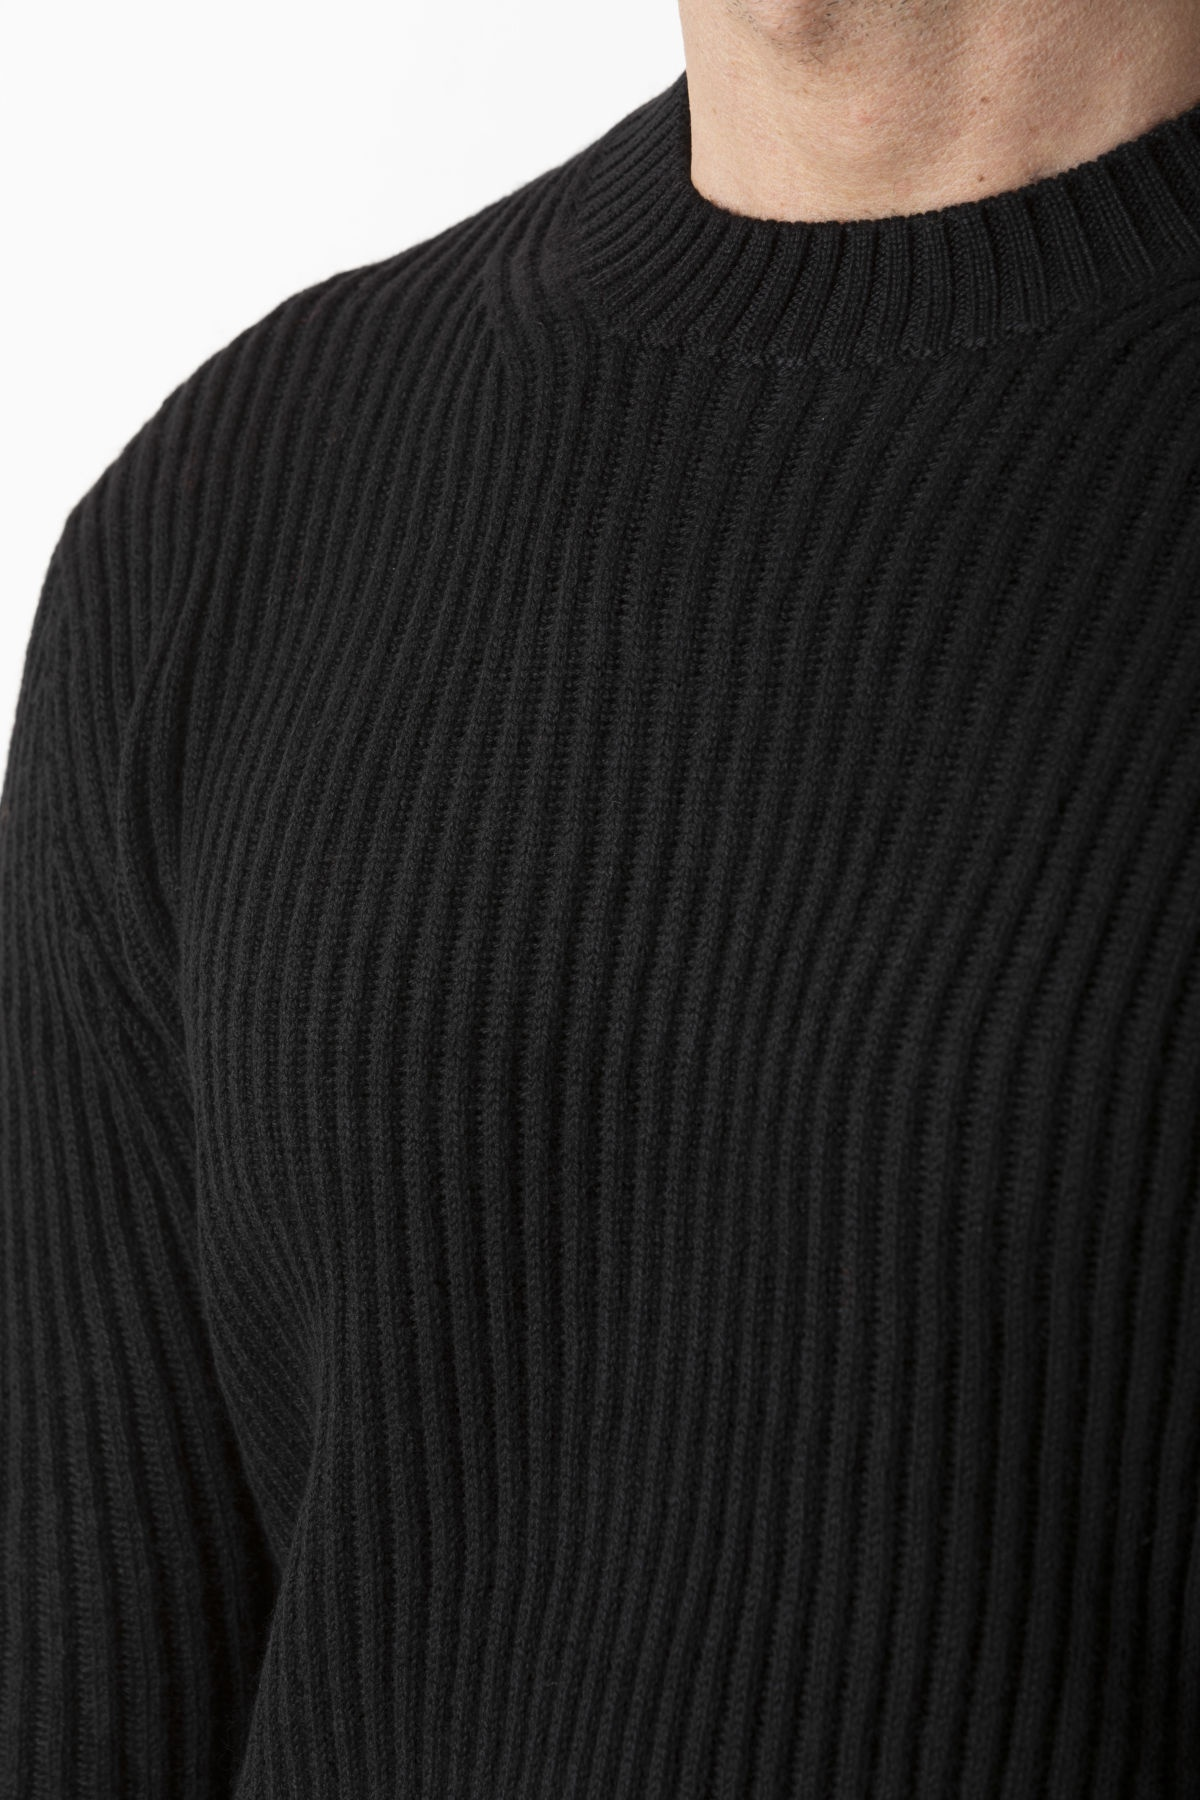 Pullover for man FILIPPO DE LAURENTIIS F/W 19-20